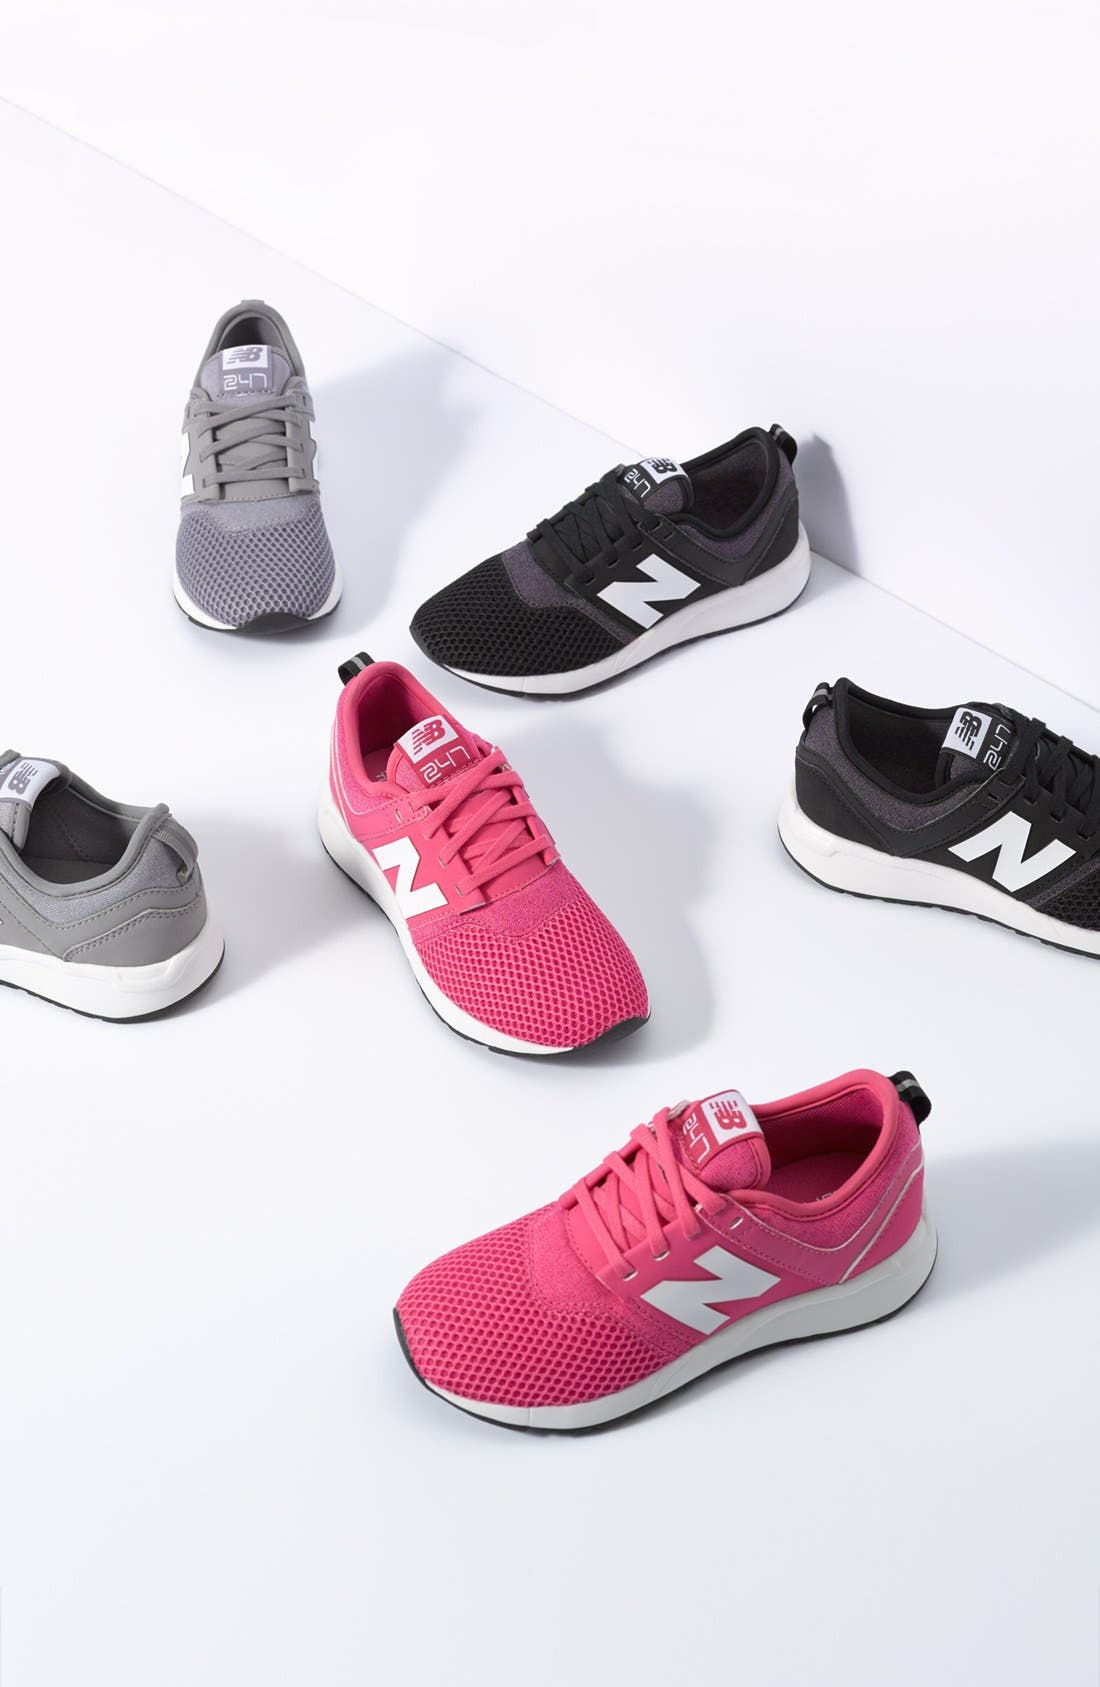 247 Sport Sneaker,                             Main thumbnail 1, color,                             001